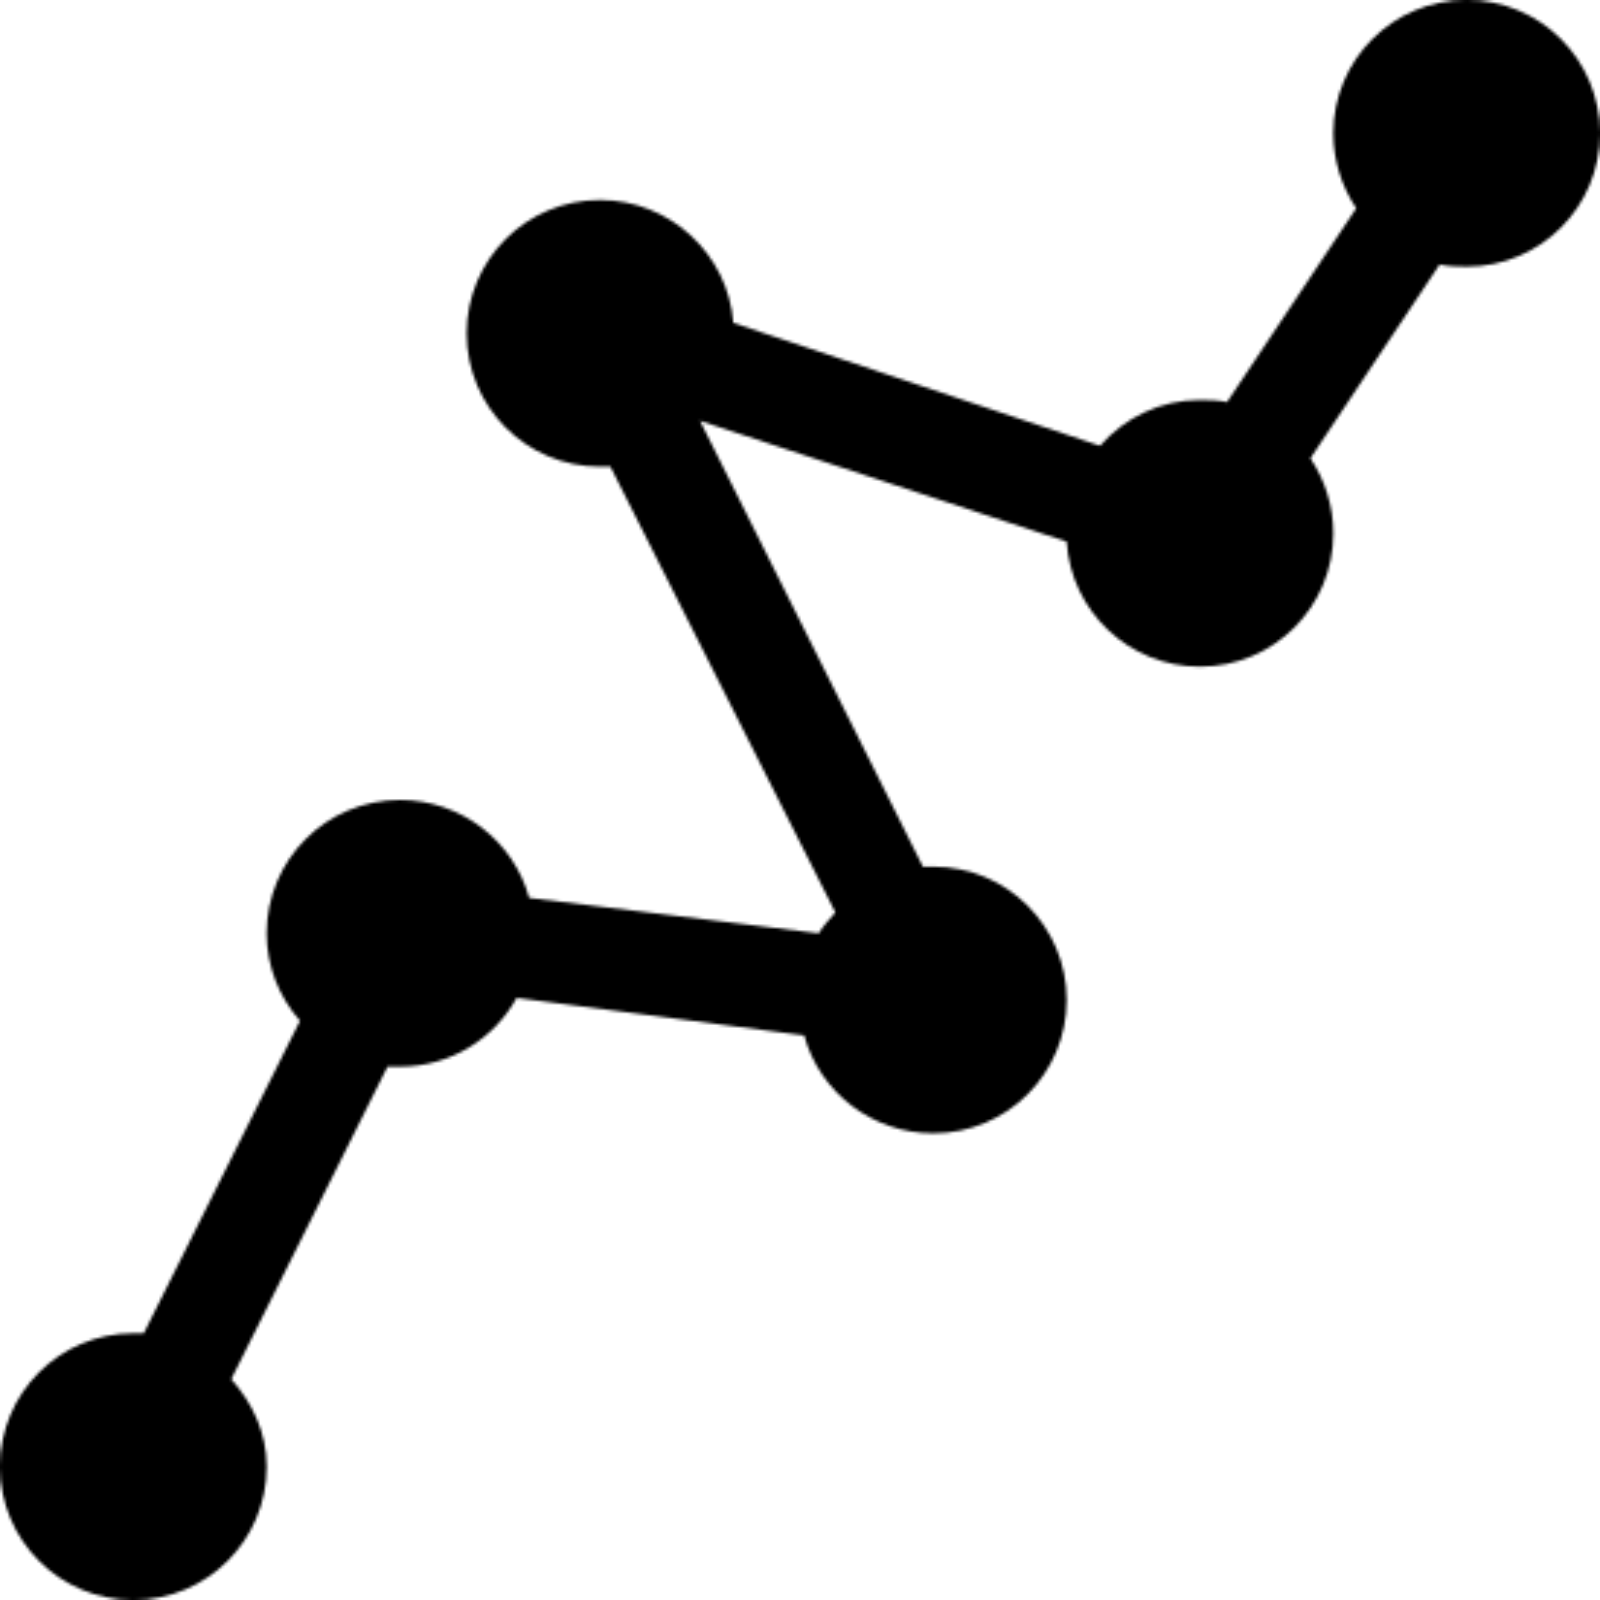 Polyline icon